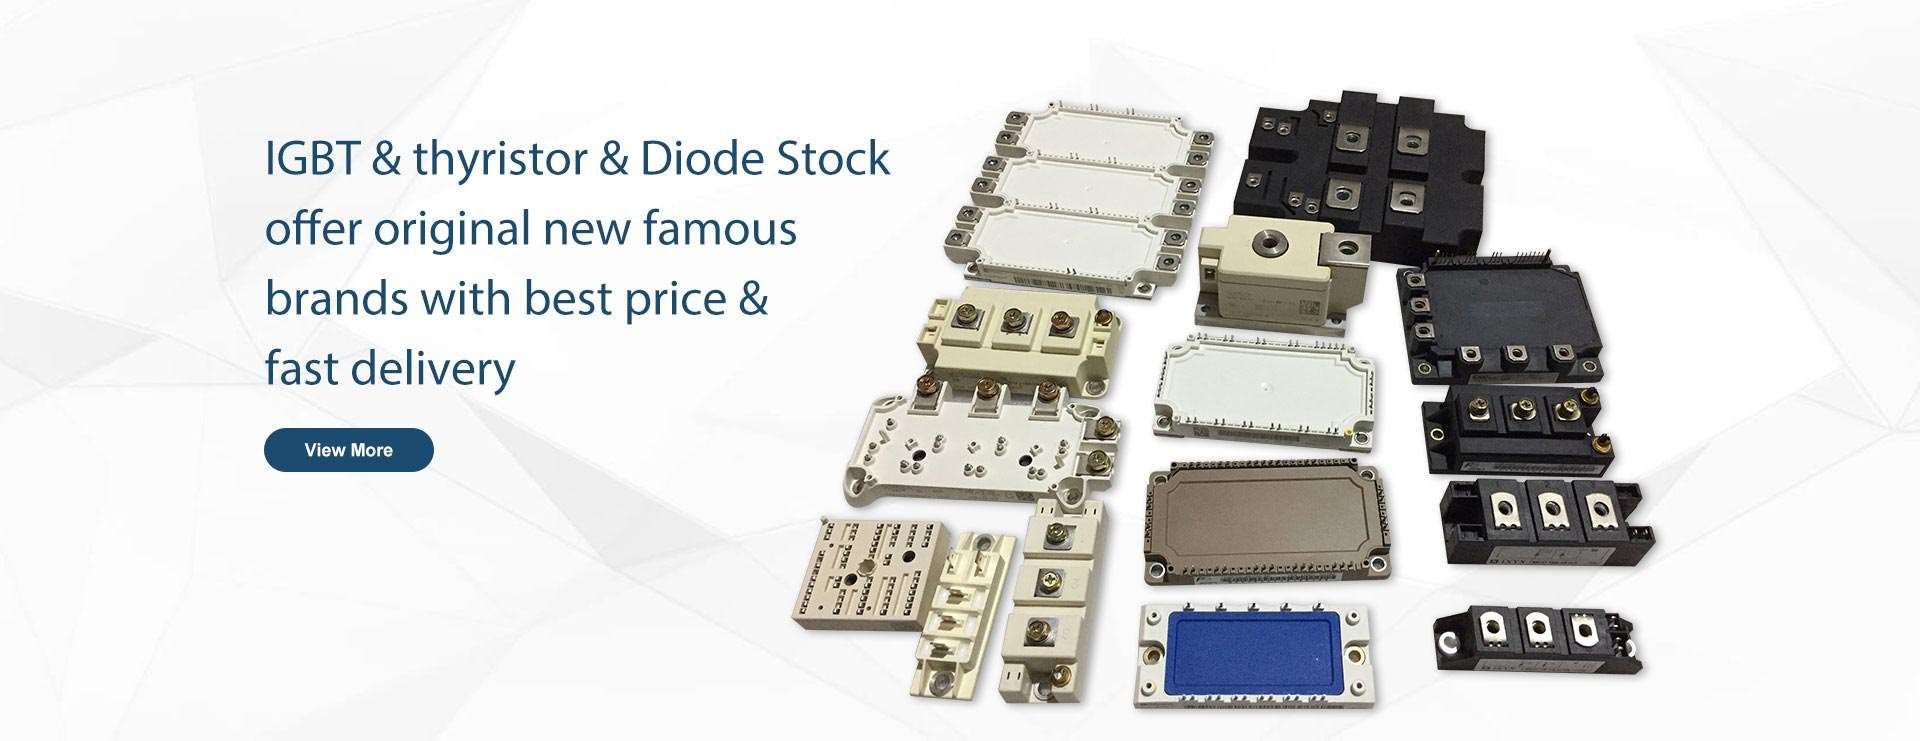 IGBT & Thyristor & Diode Module